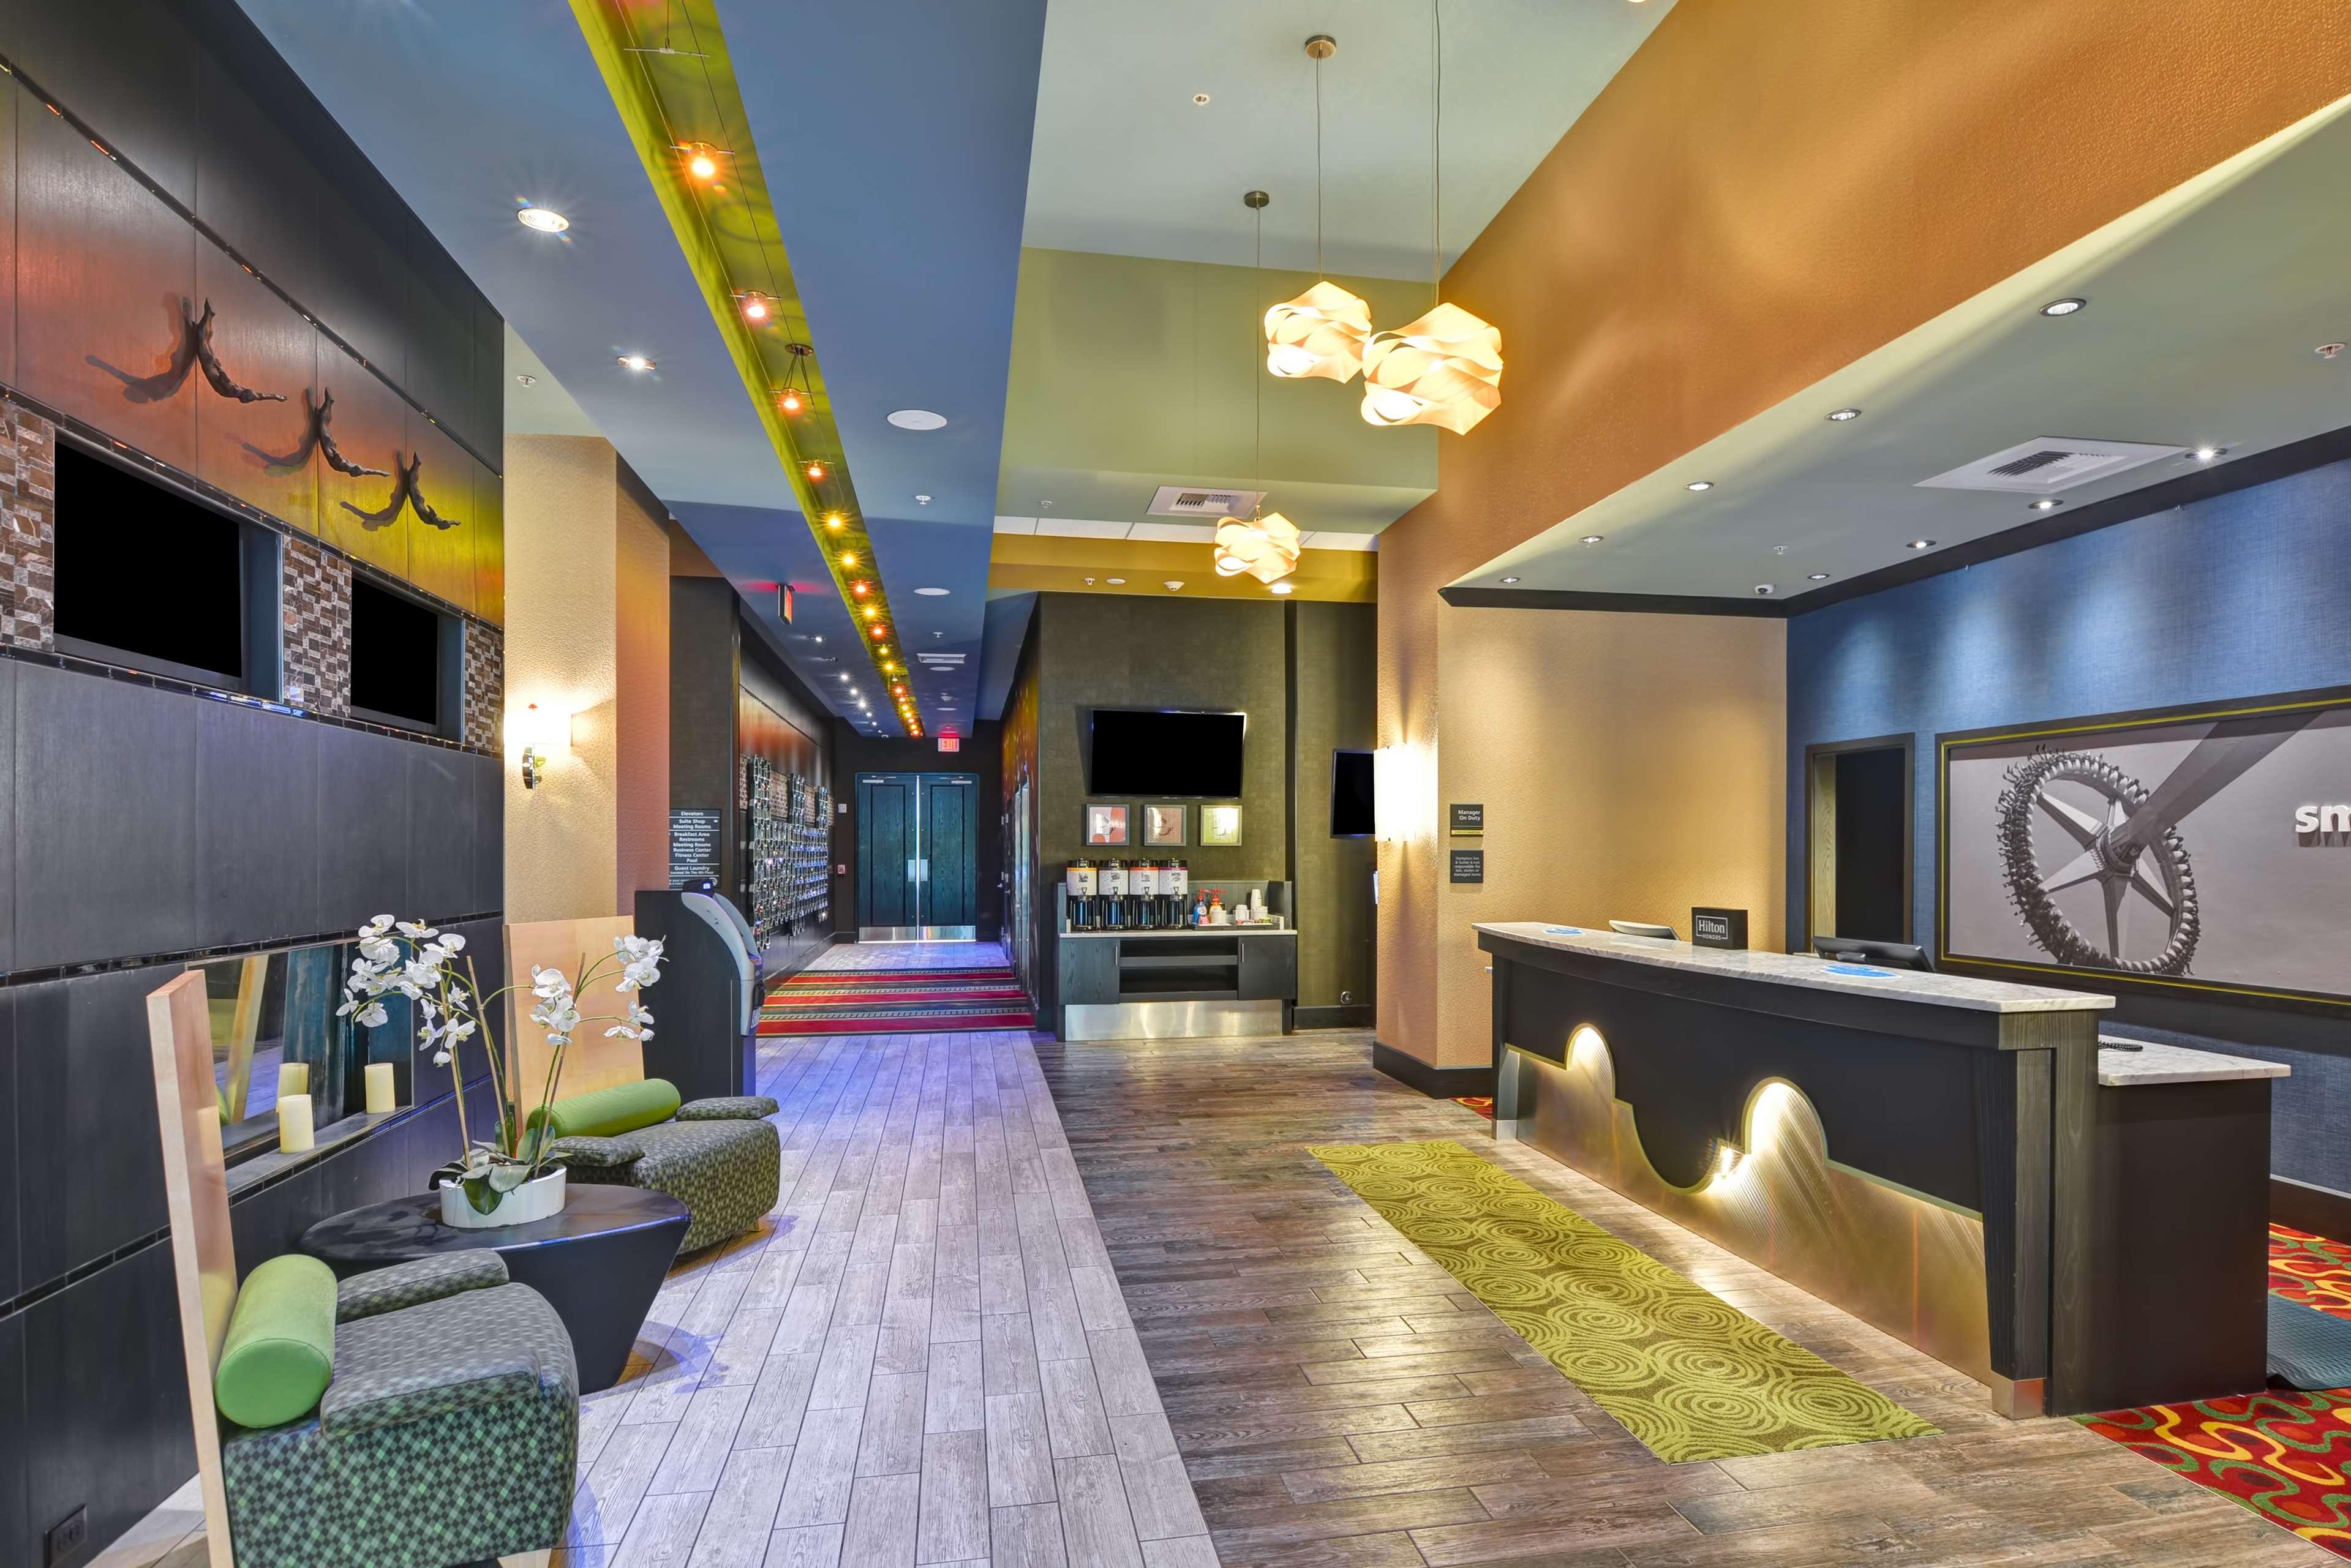 Hampton Inn & Suites Raleigh/Crabtree Valley image 5